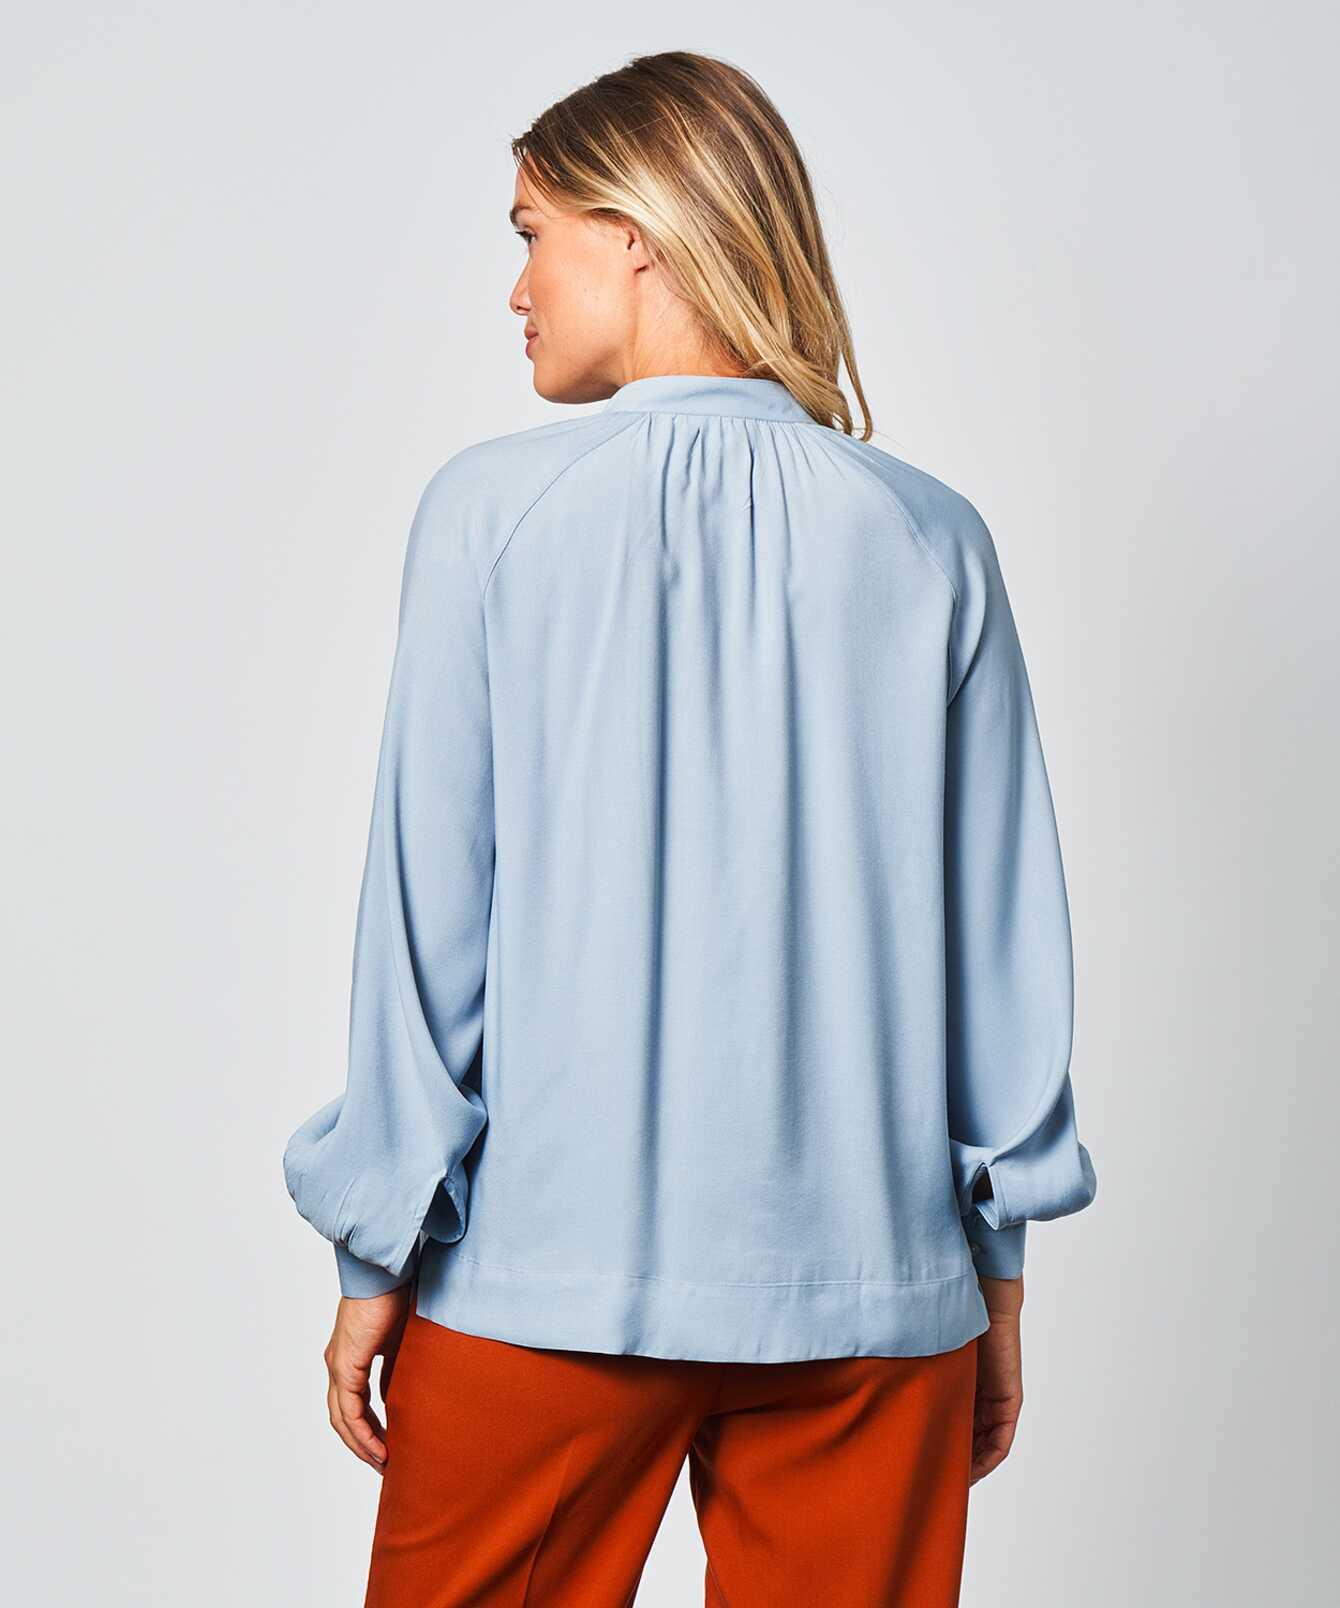 Shirt Mira Verona Dusty Blue The Shirt Factory